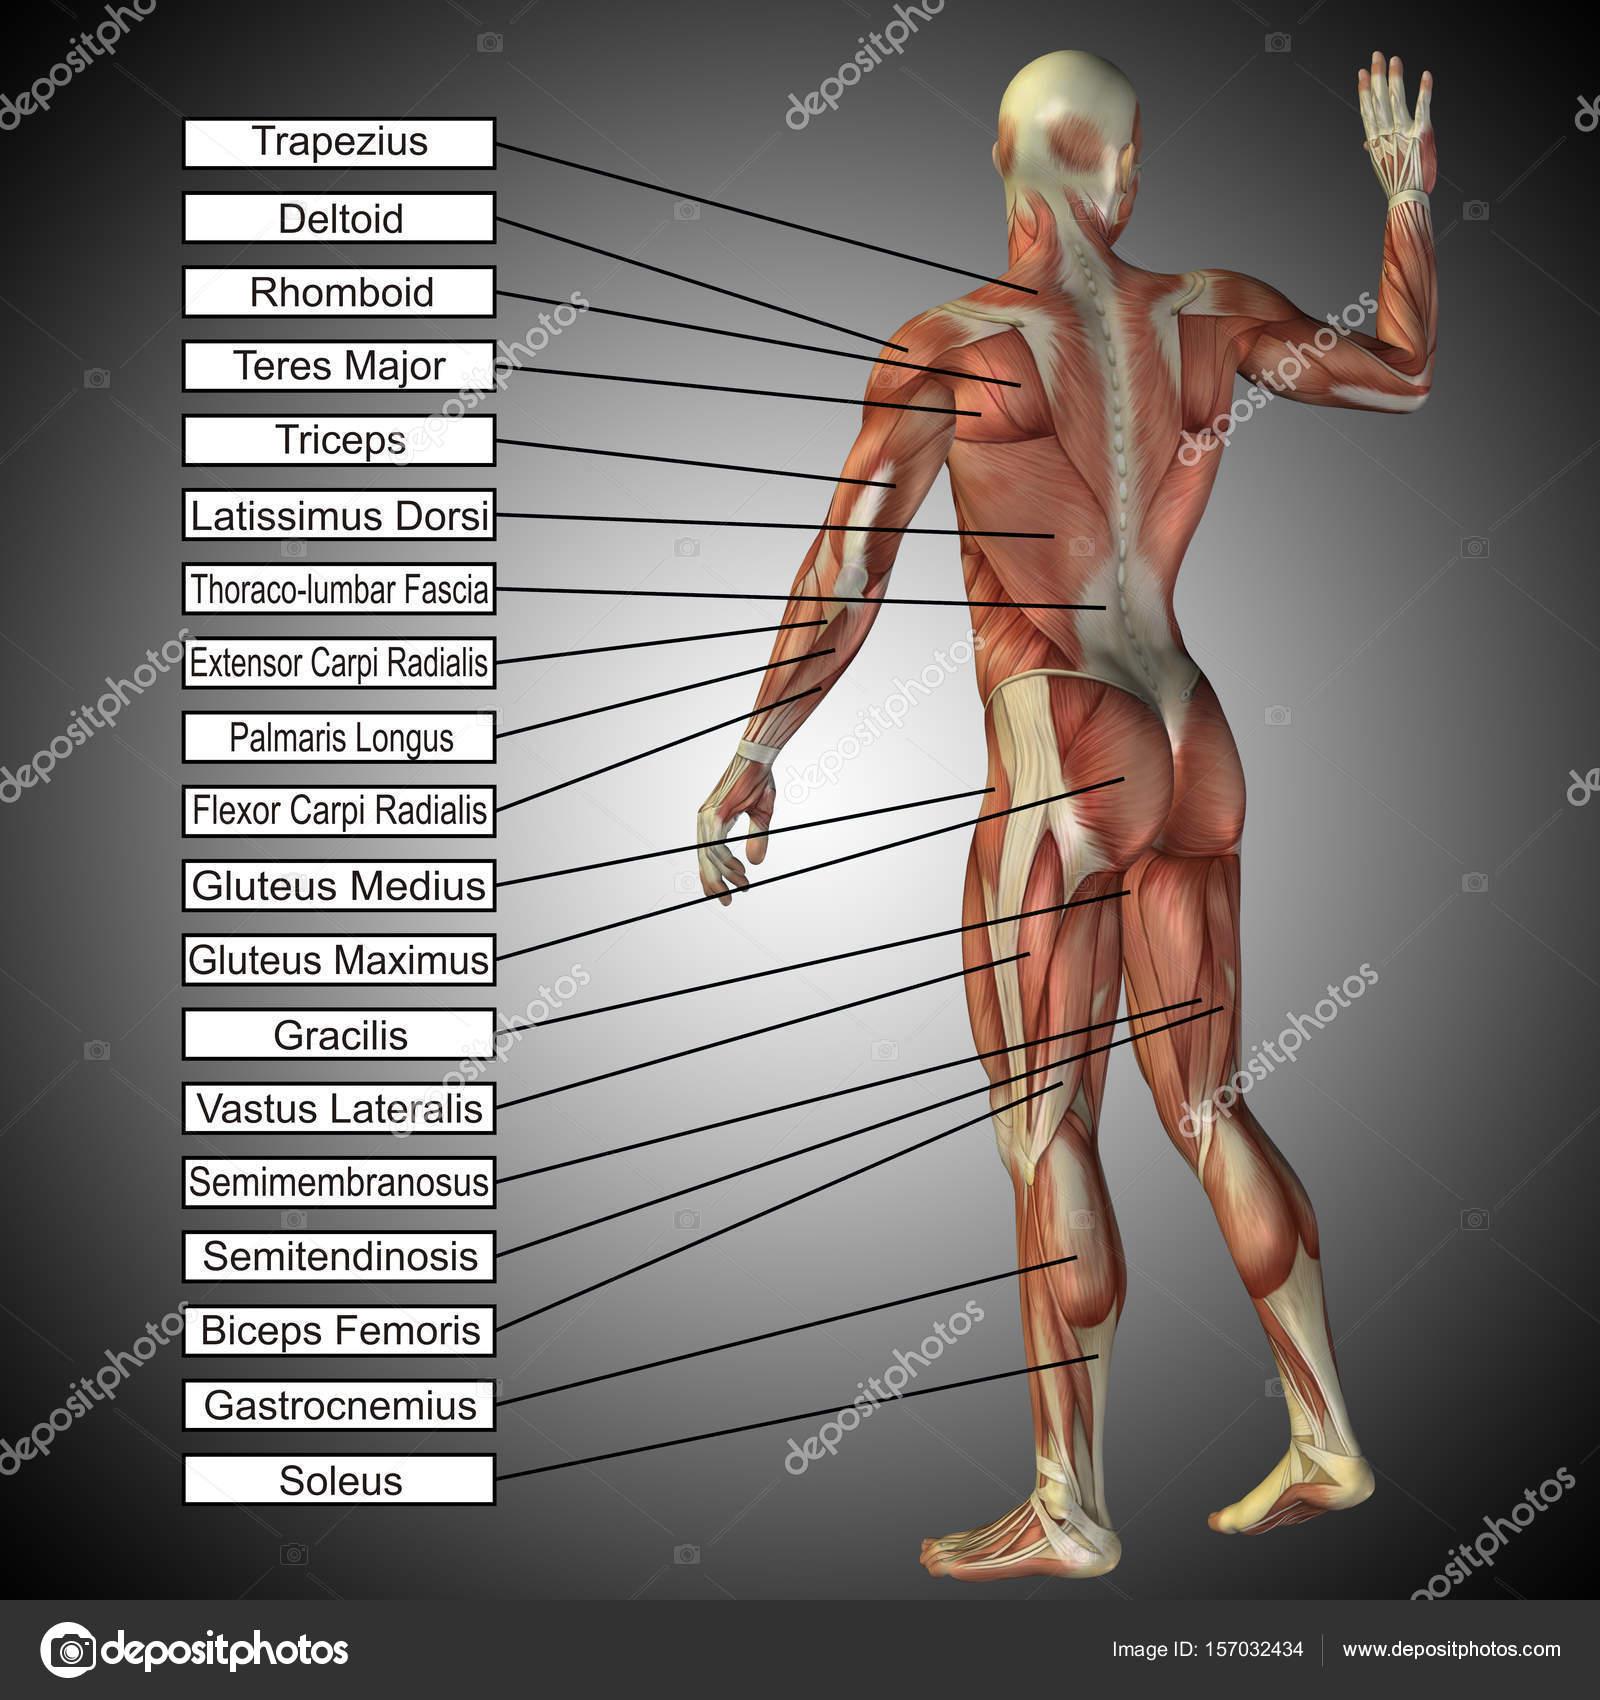 maqueta de anatomía humana — Foto de stock © design36 #157032434